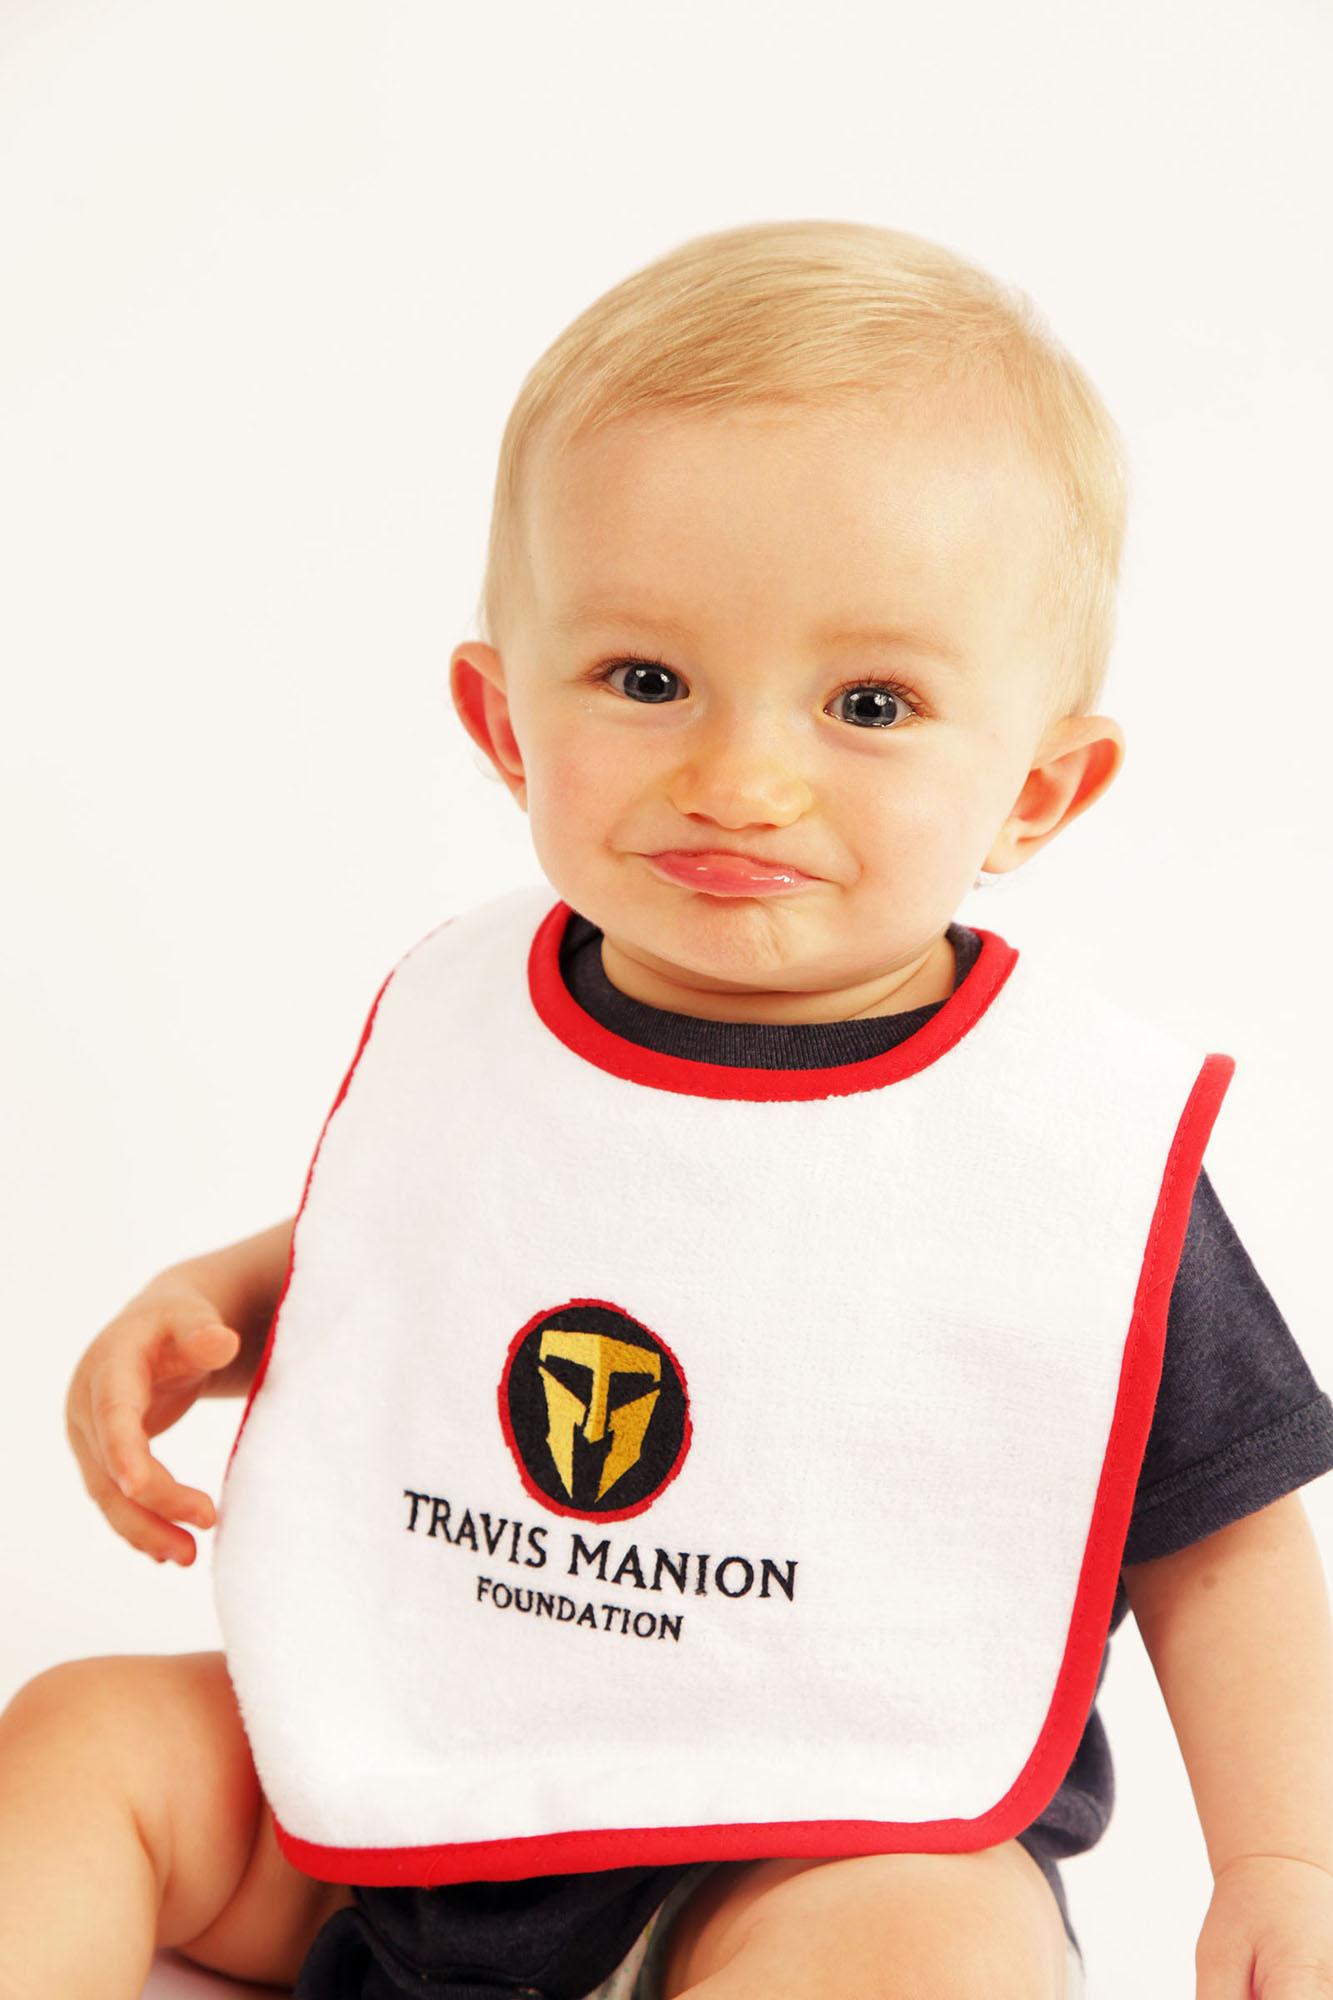 Travis Manion Foundation Infant Contrast Terry Bib